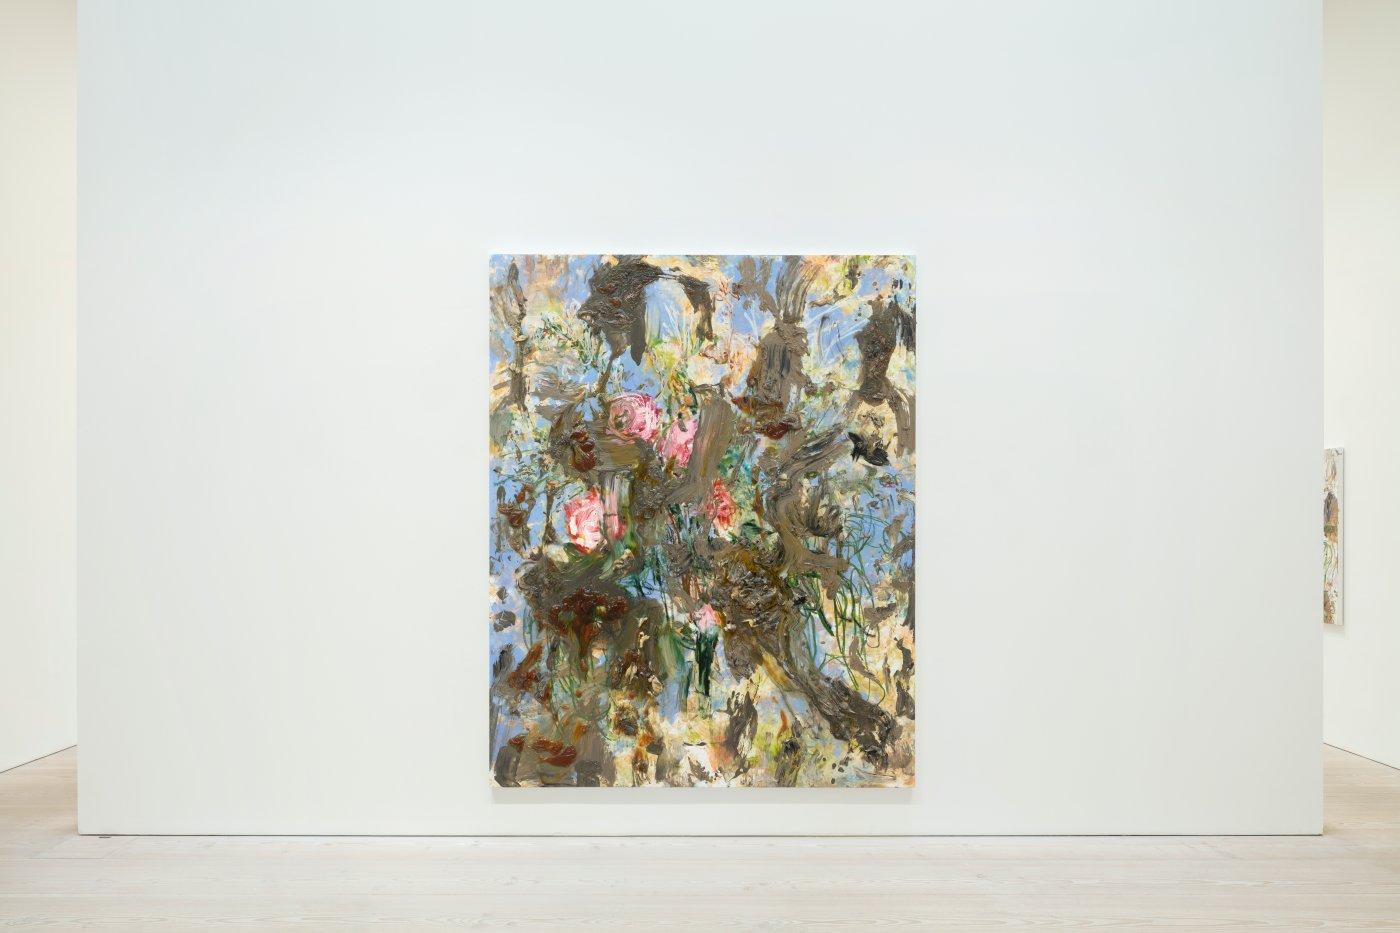 Galerie Forsblom Heikki Marila 2